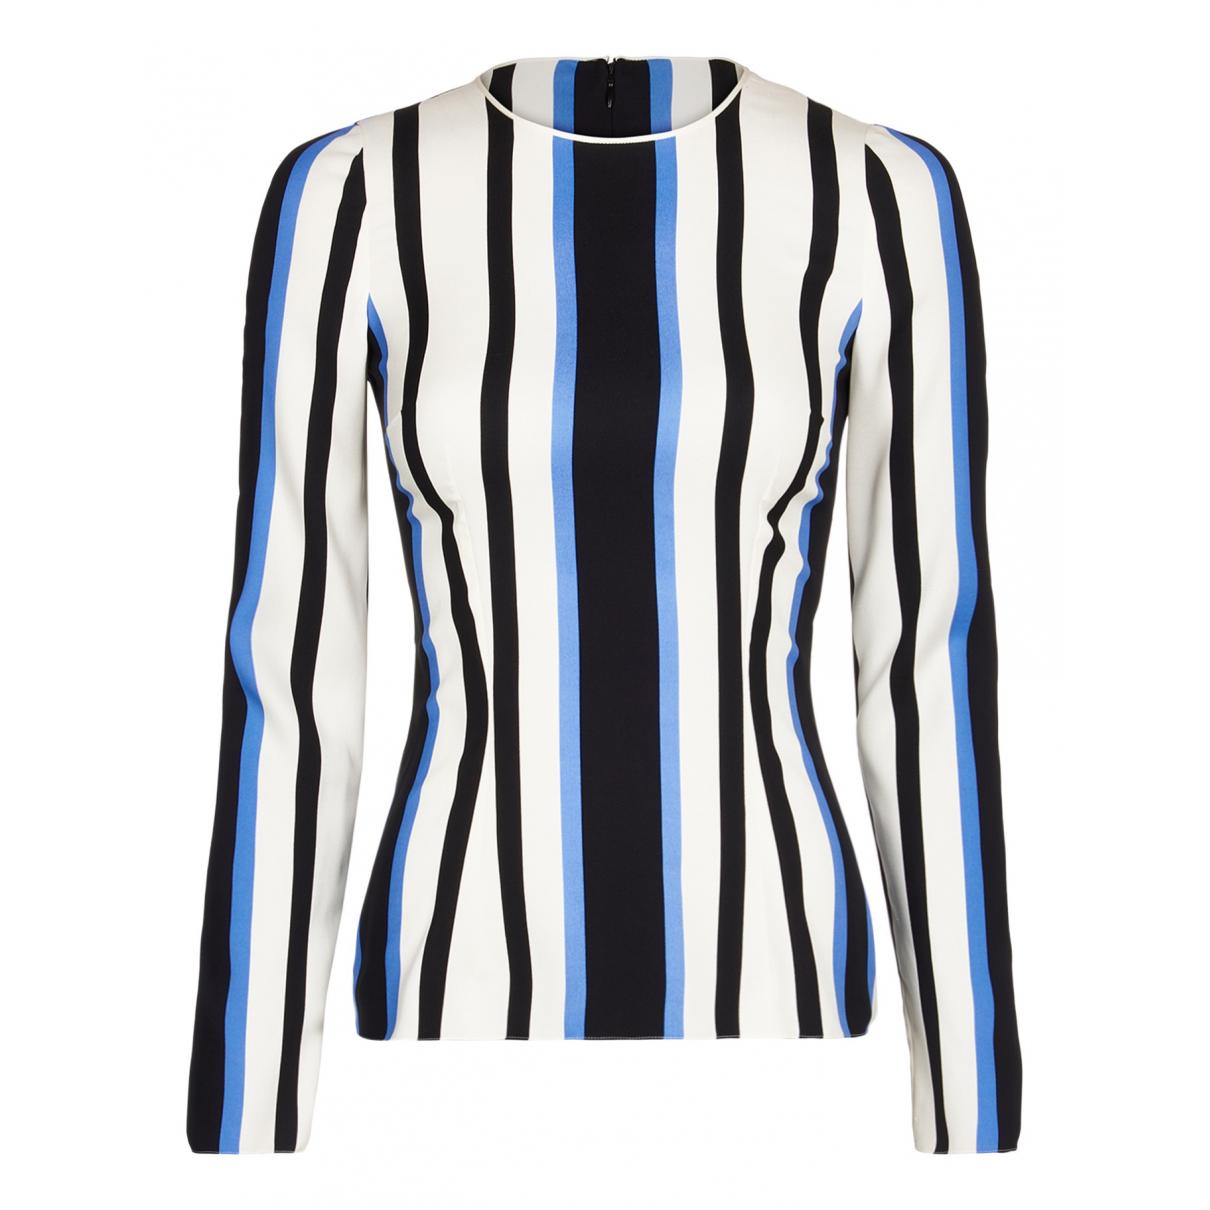 Dolce & Gabbana N Multicolour Silk  top for Women 8 UK